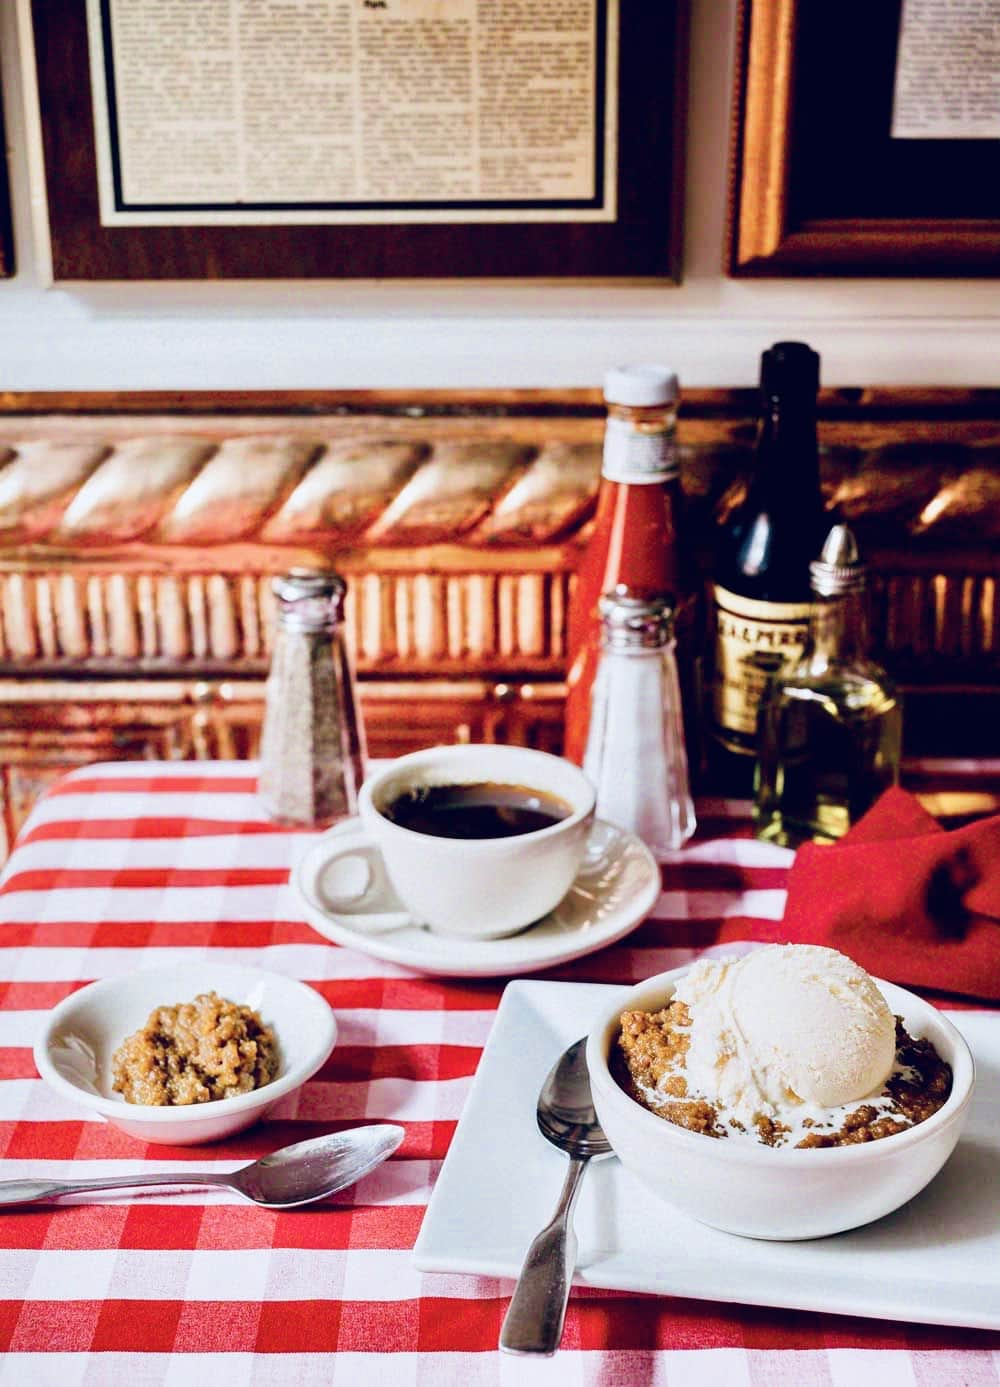 The Hirshon Durgin-Park Indian Pudding With Vanilla Gelato